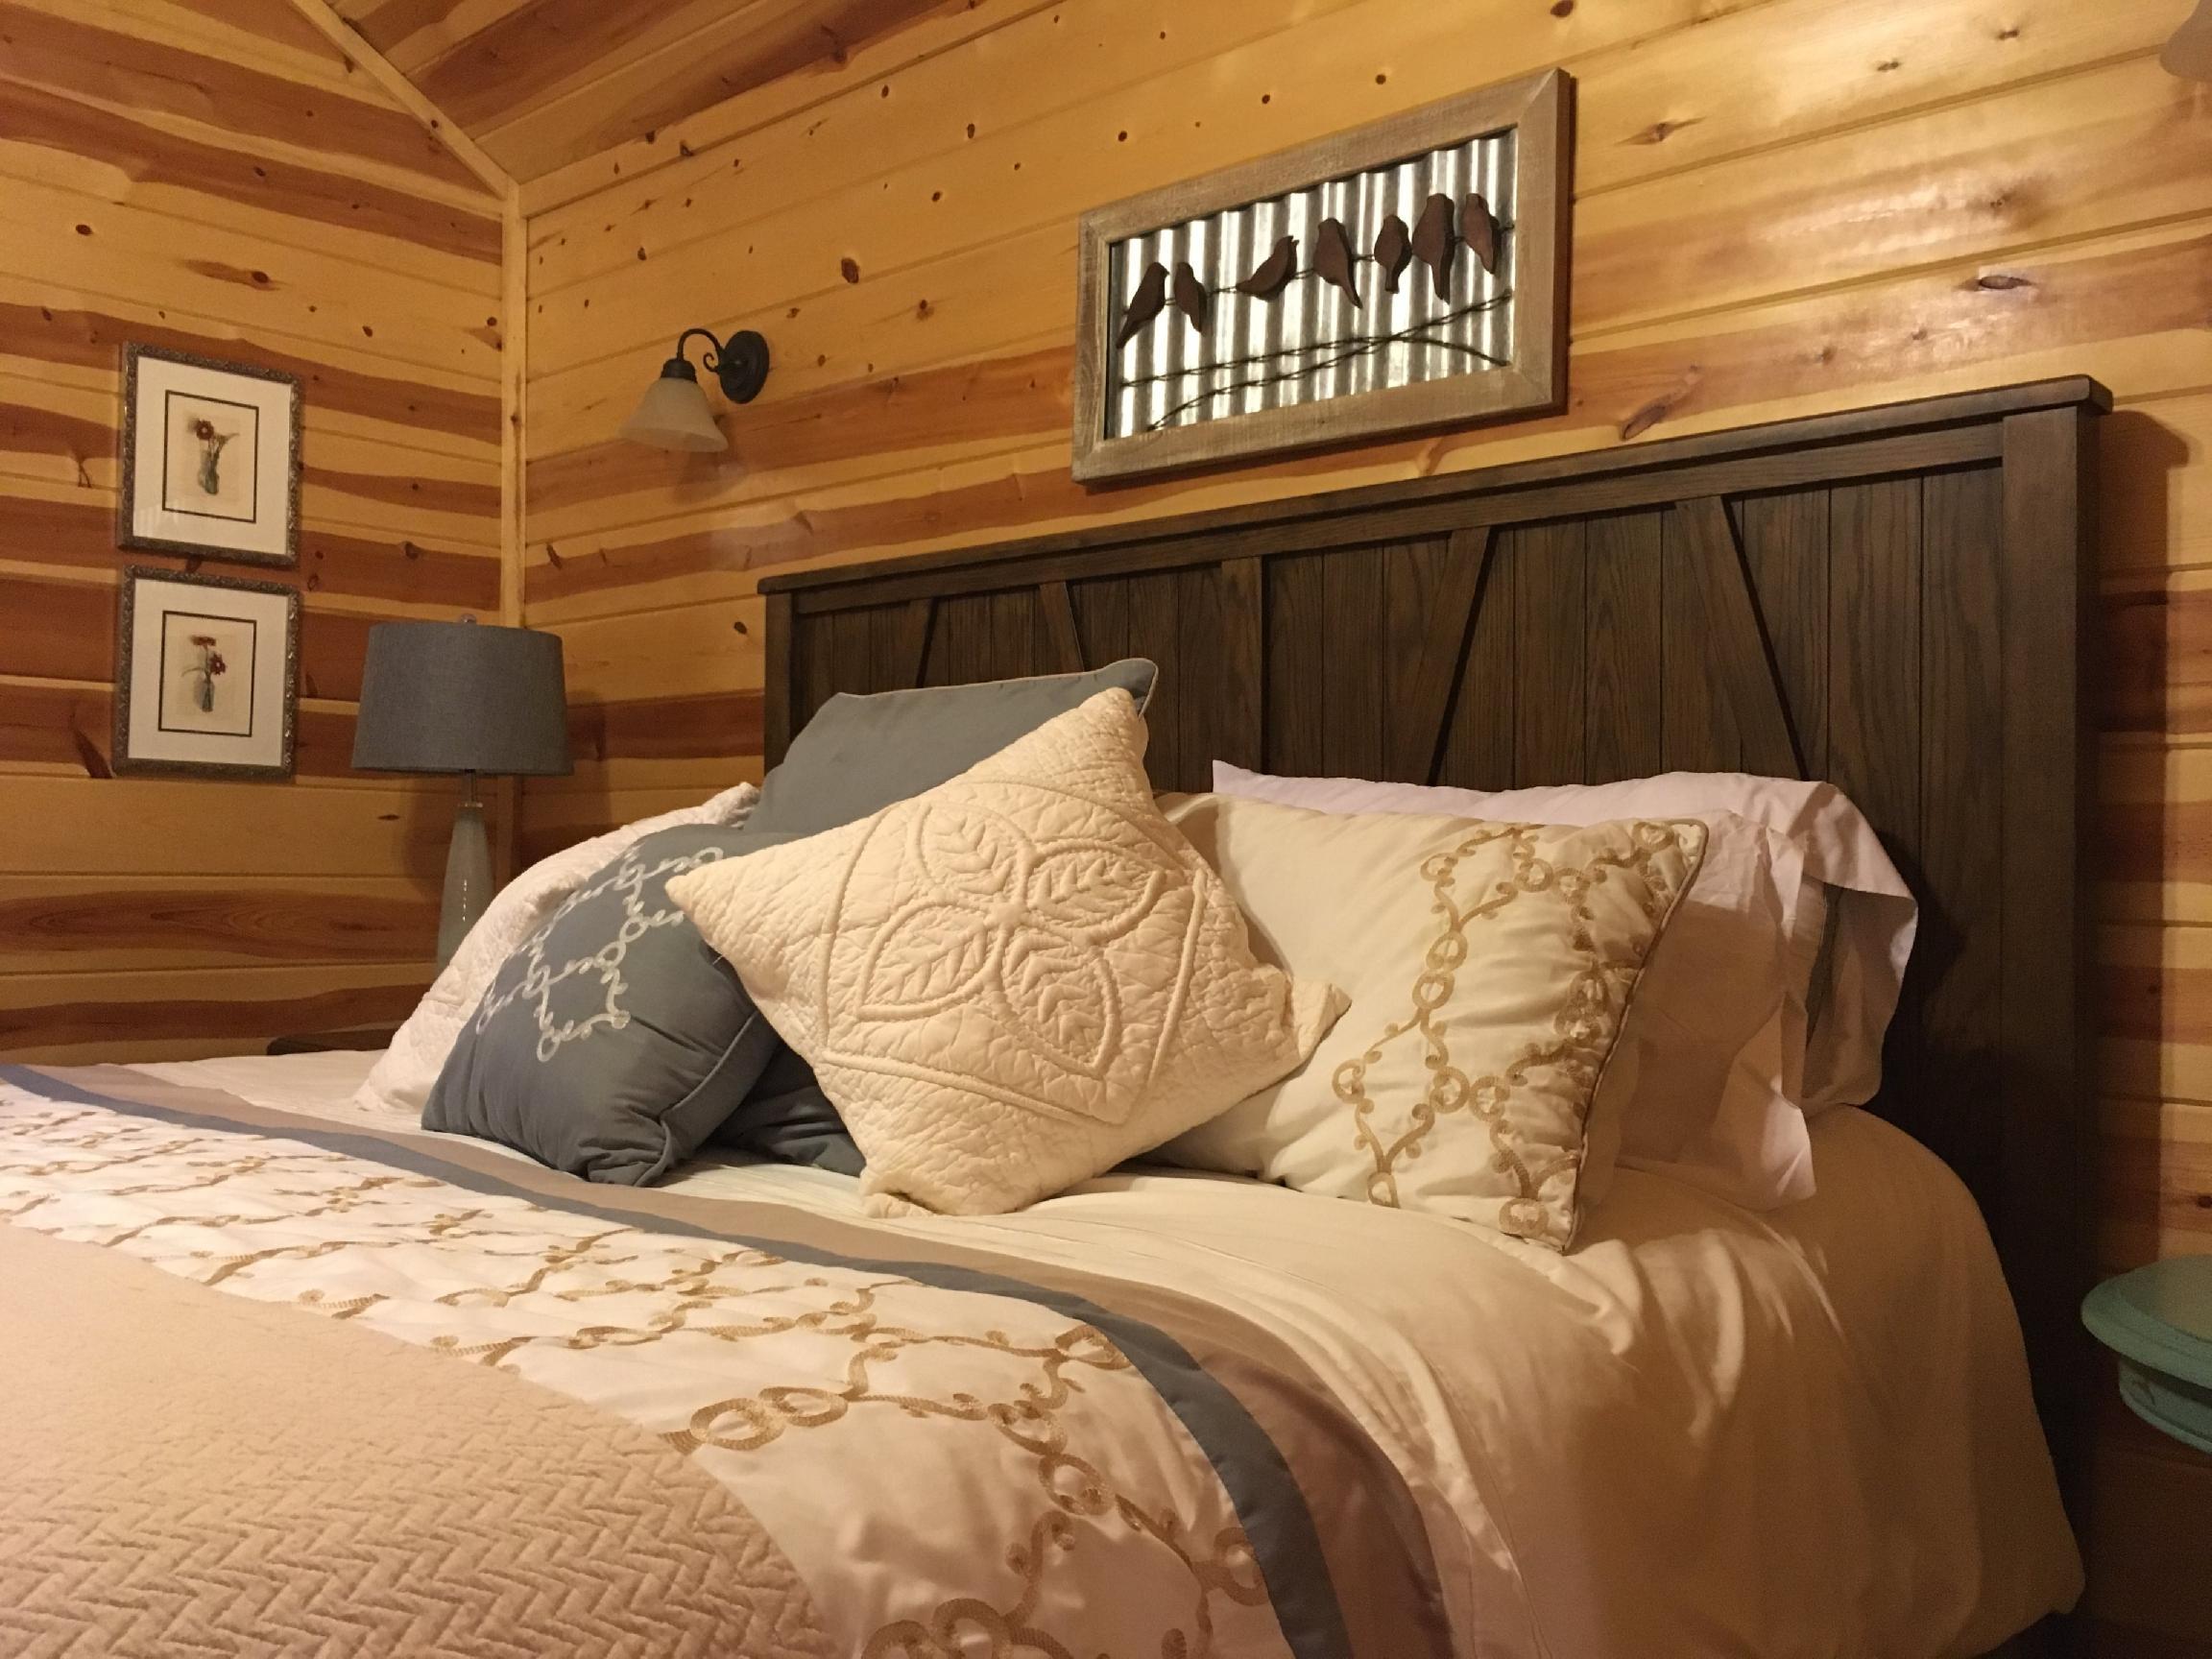 Shear Comfort-1 Night Stays, Farmhouse Decor photo 15958395